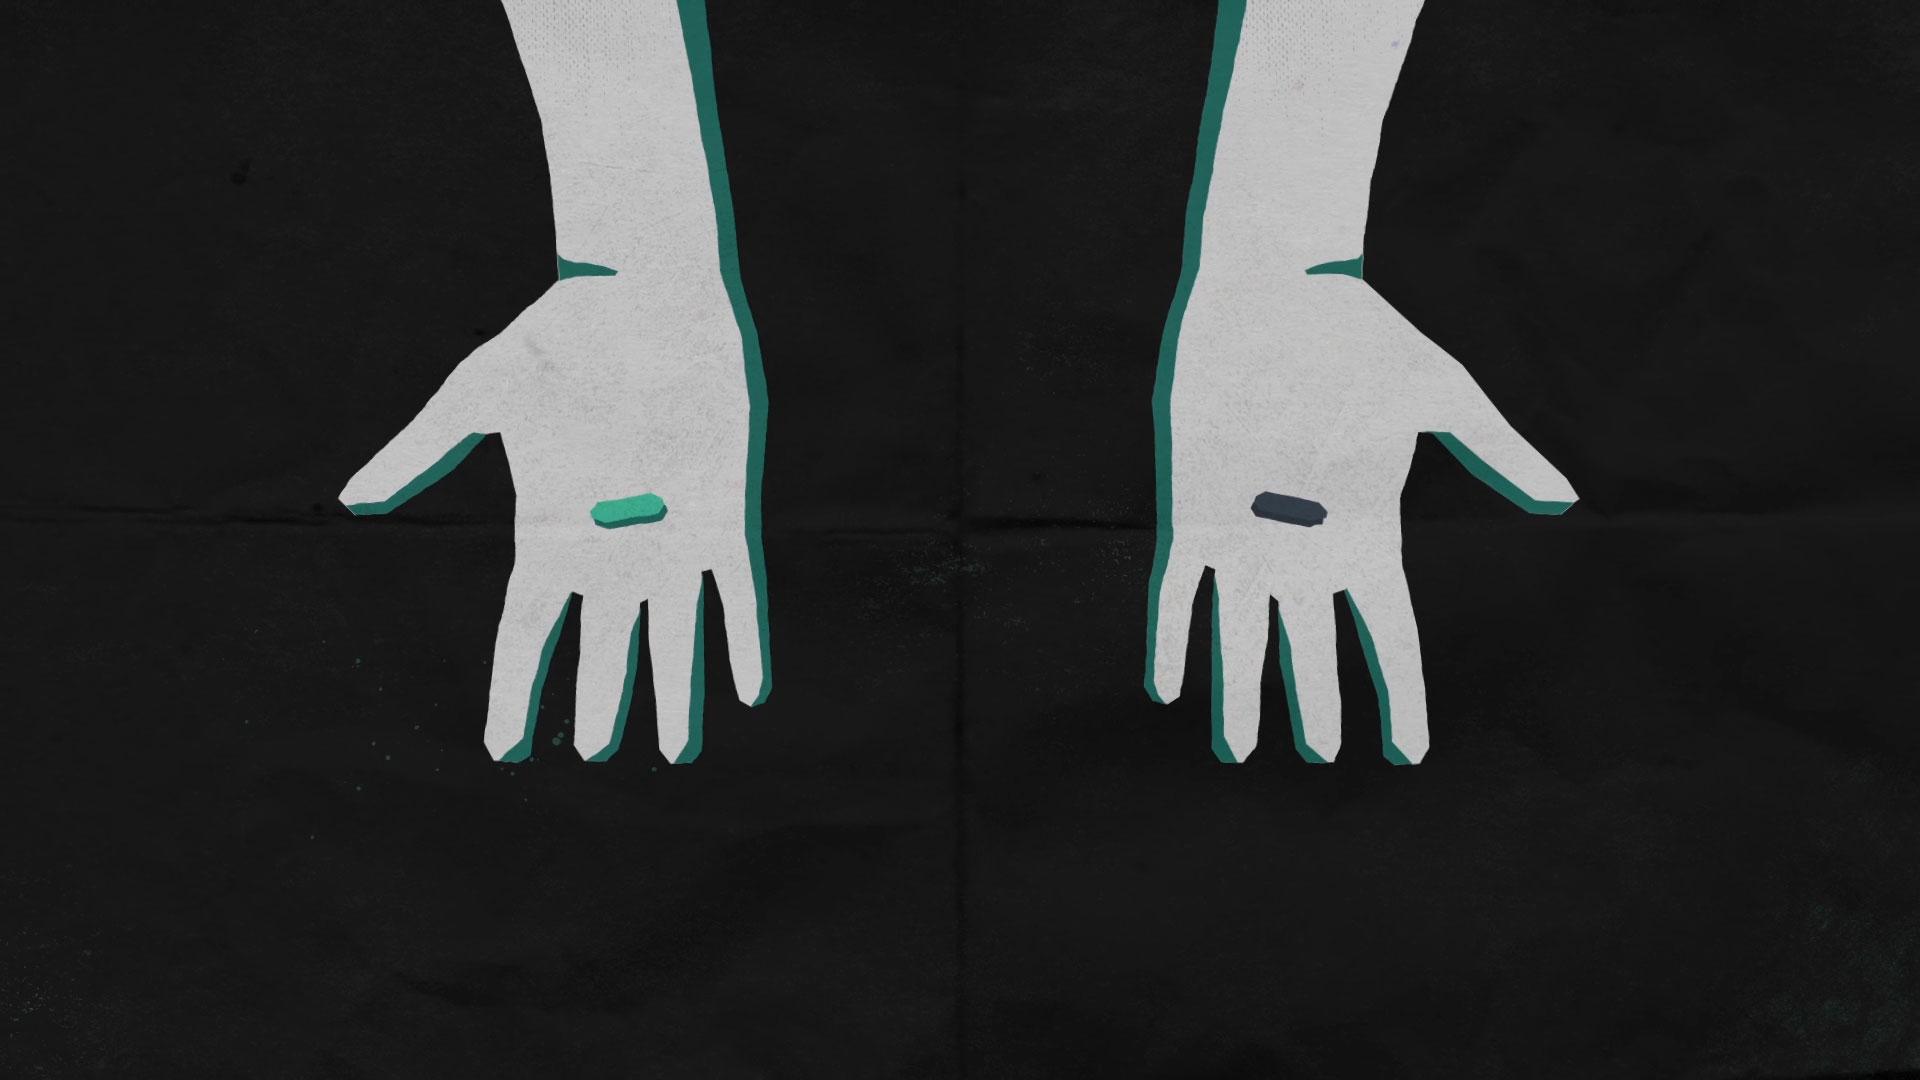 Mubi hands animation